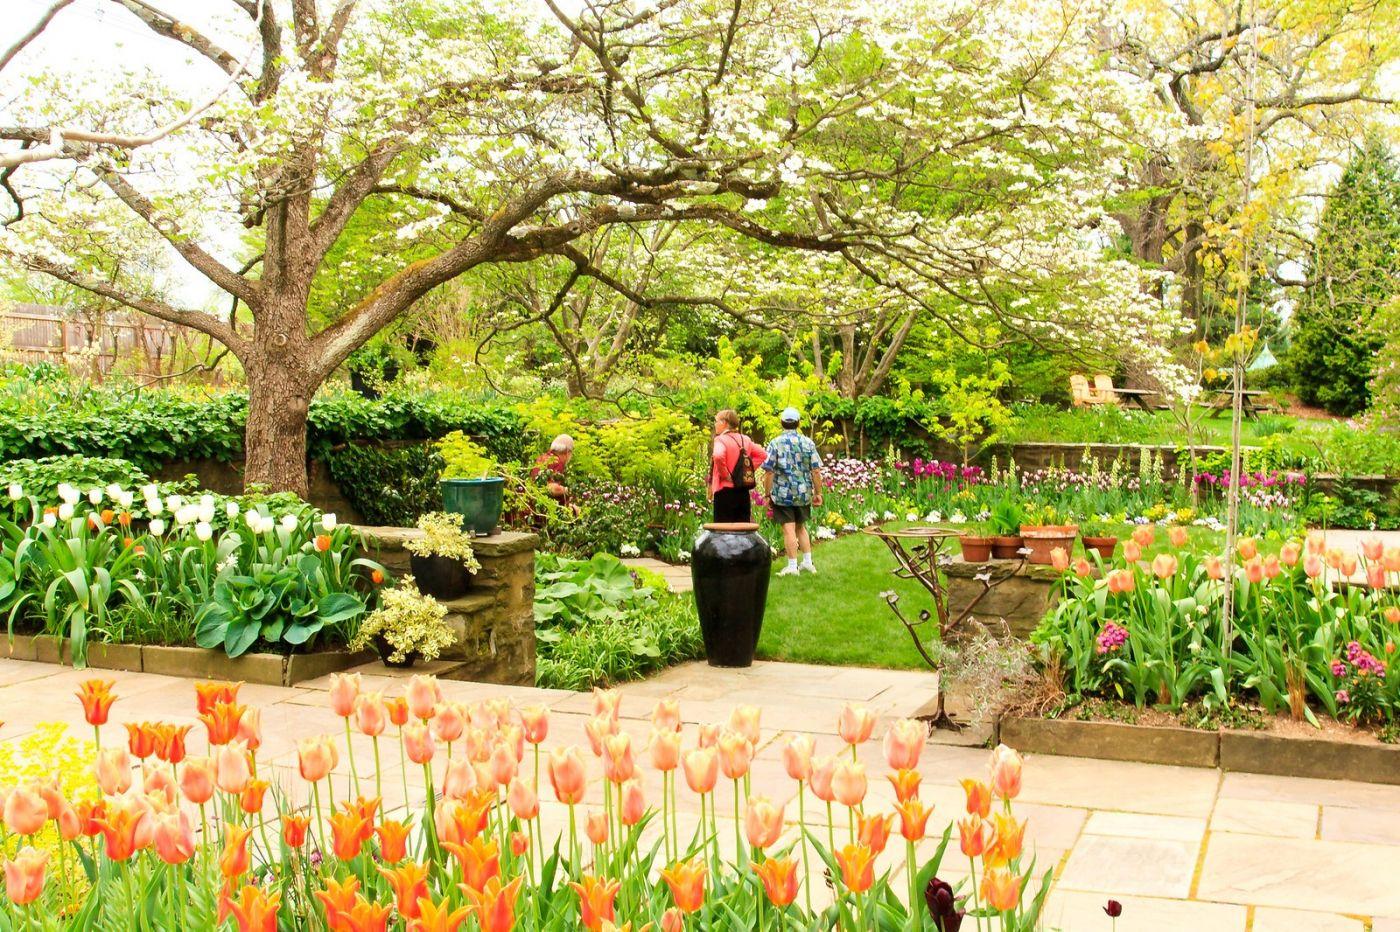 Chanticleer花园,享受大自然_图1-30